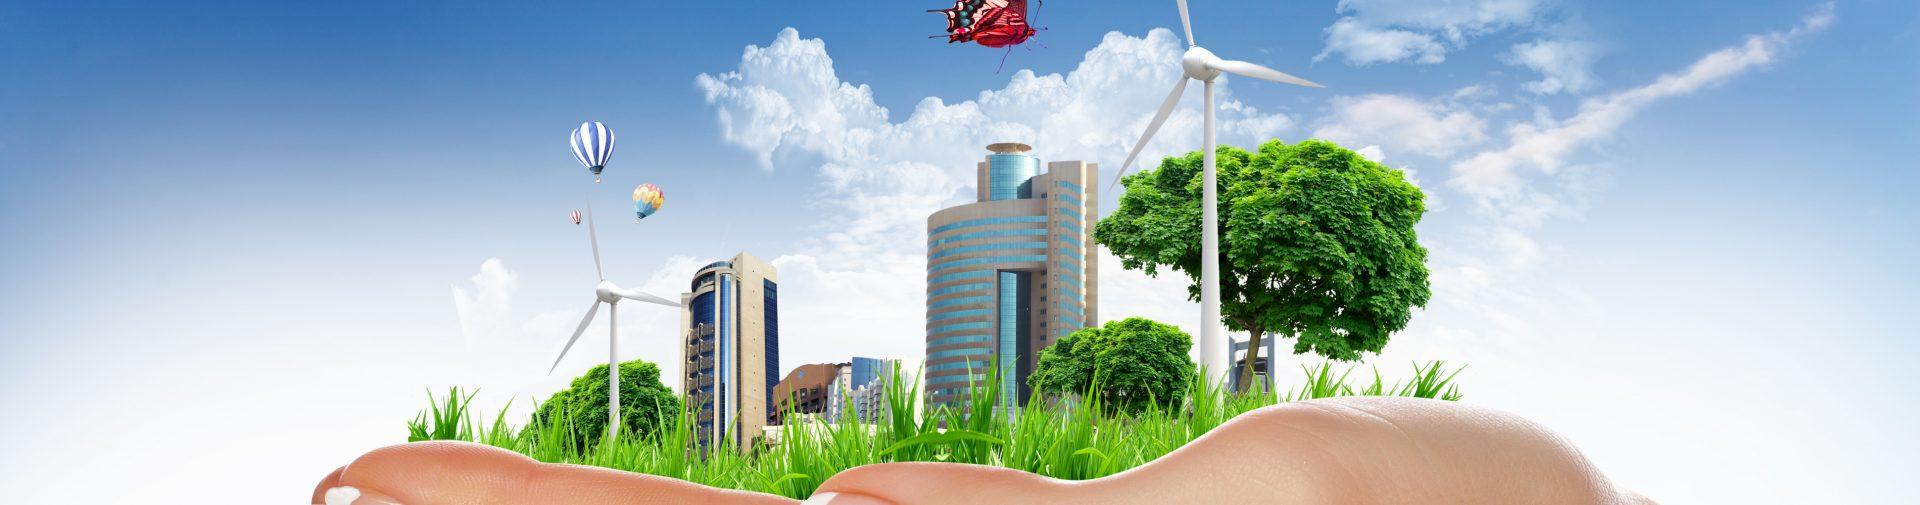 Human hand holding a city on green grass hill